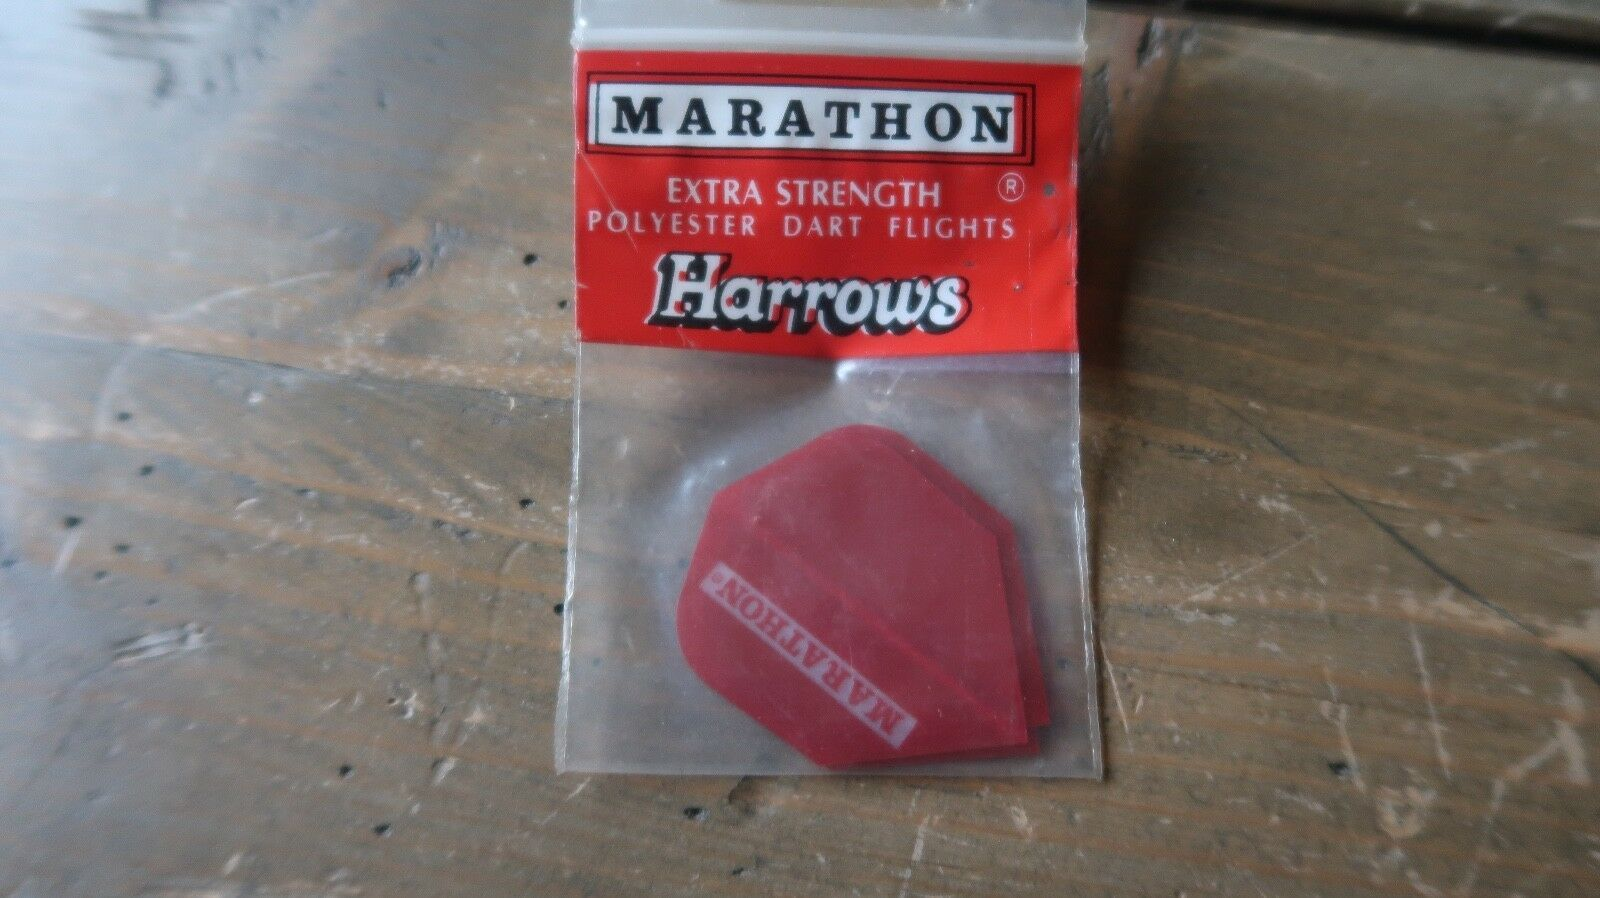 3 New Vintage Dart Flights Rot Marathon Harrows